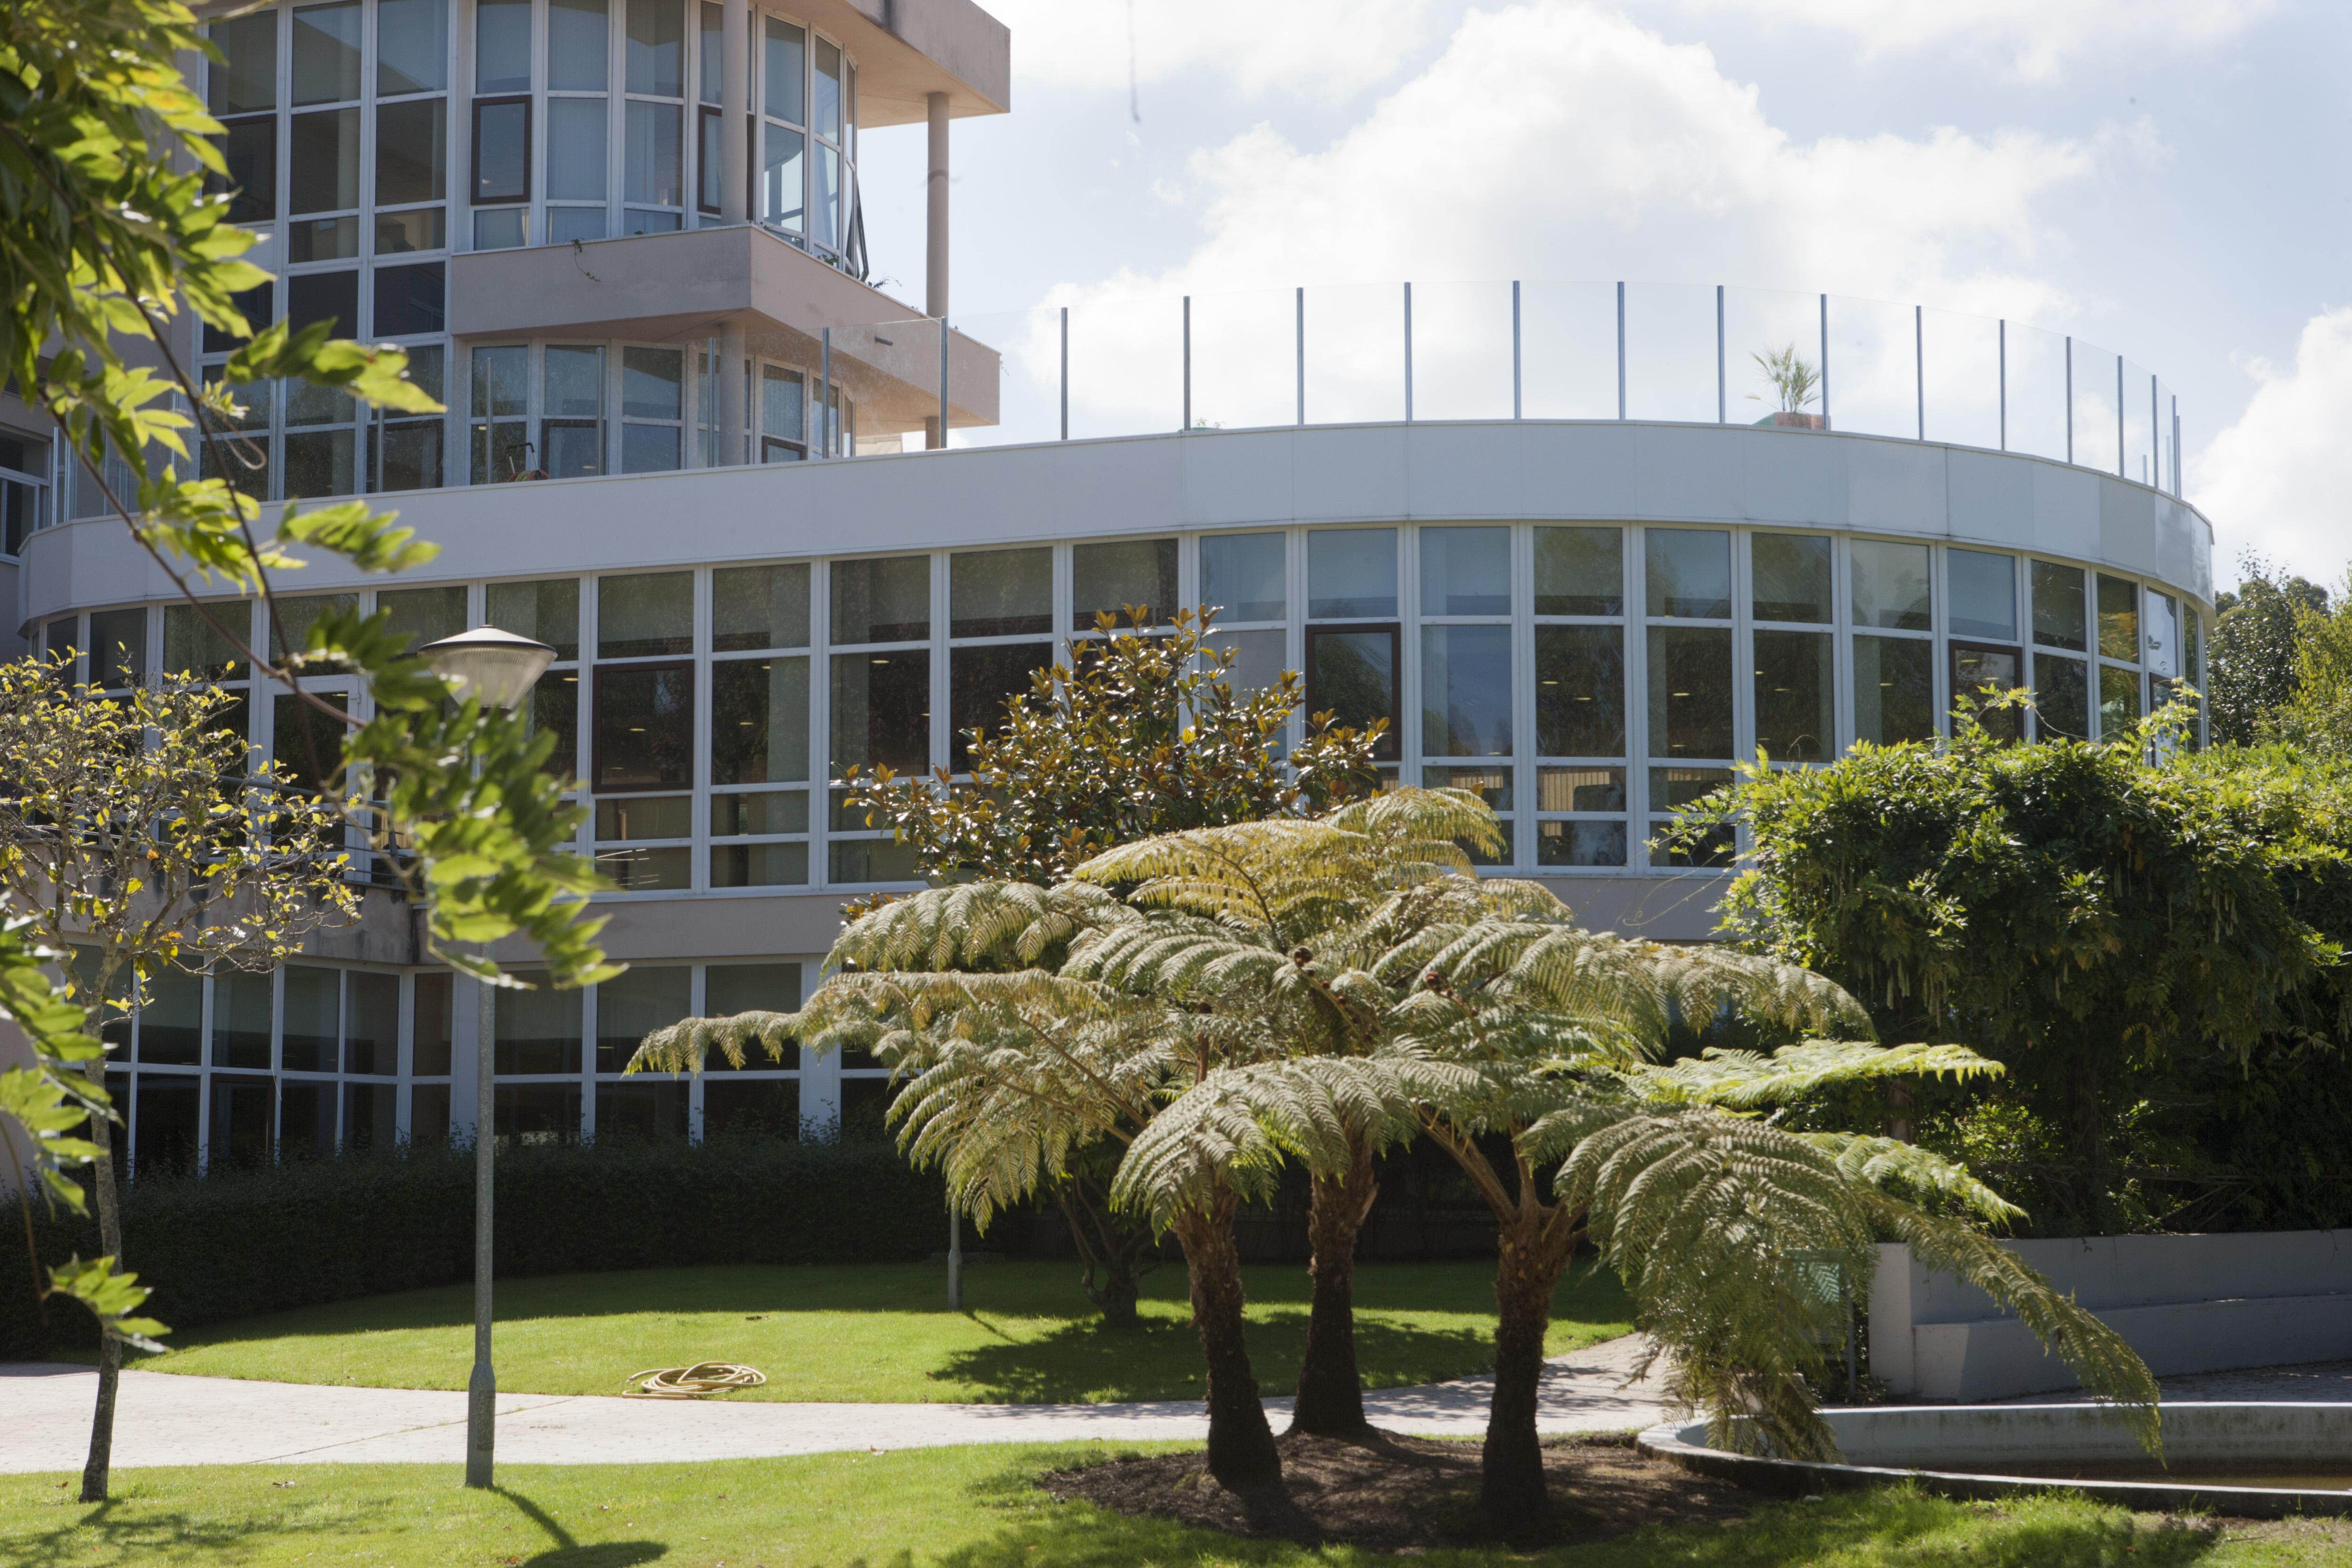 Residencia de mayores coru a residencias domusvi for Gimnasio oleiros